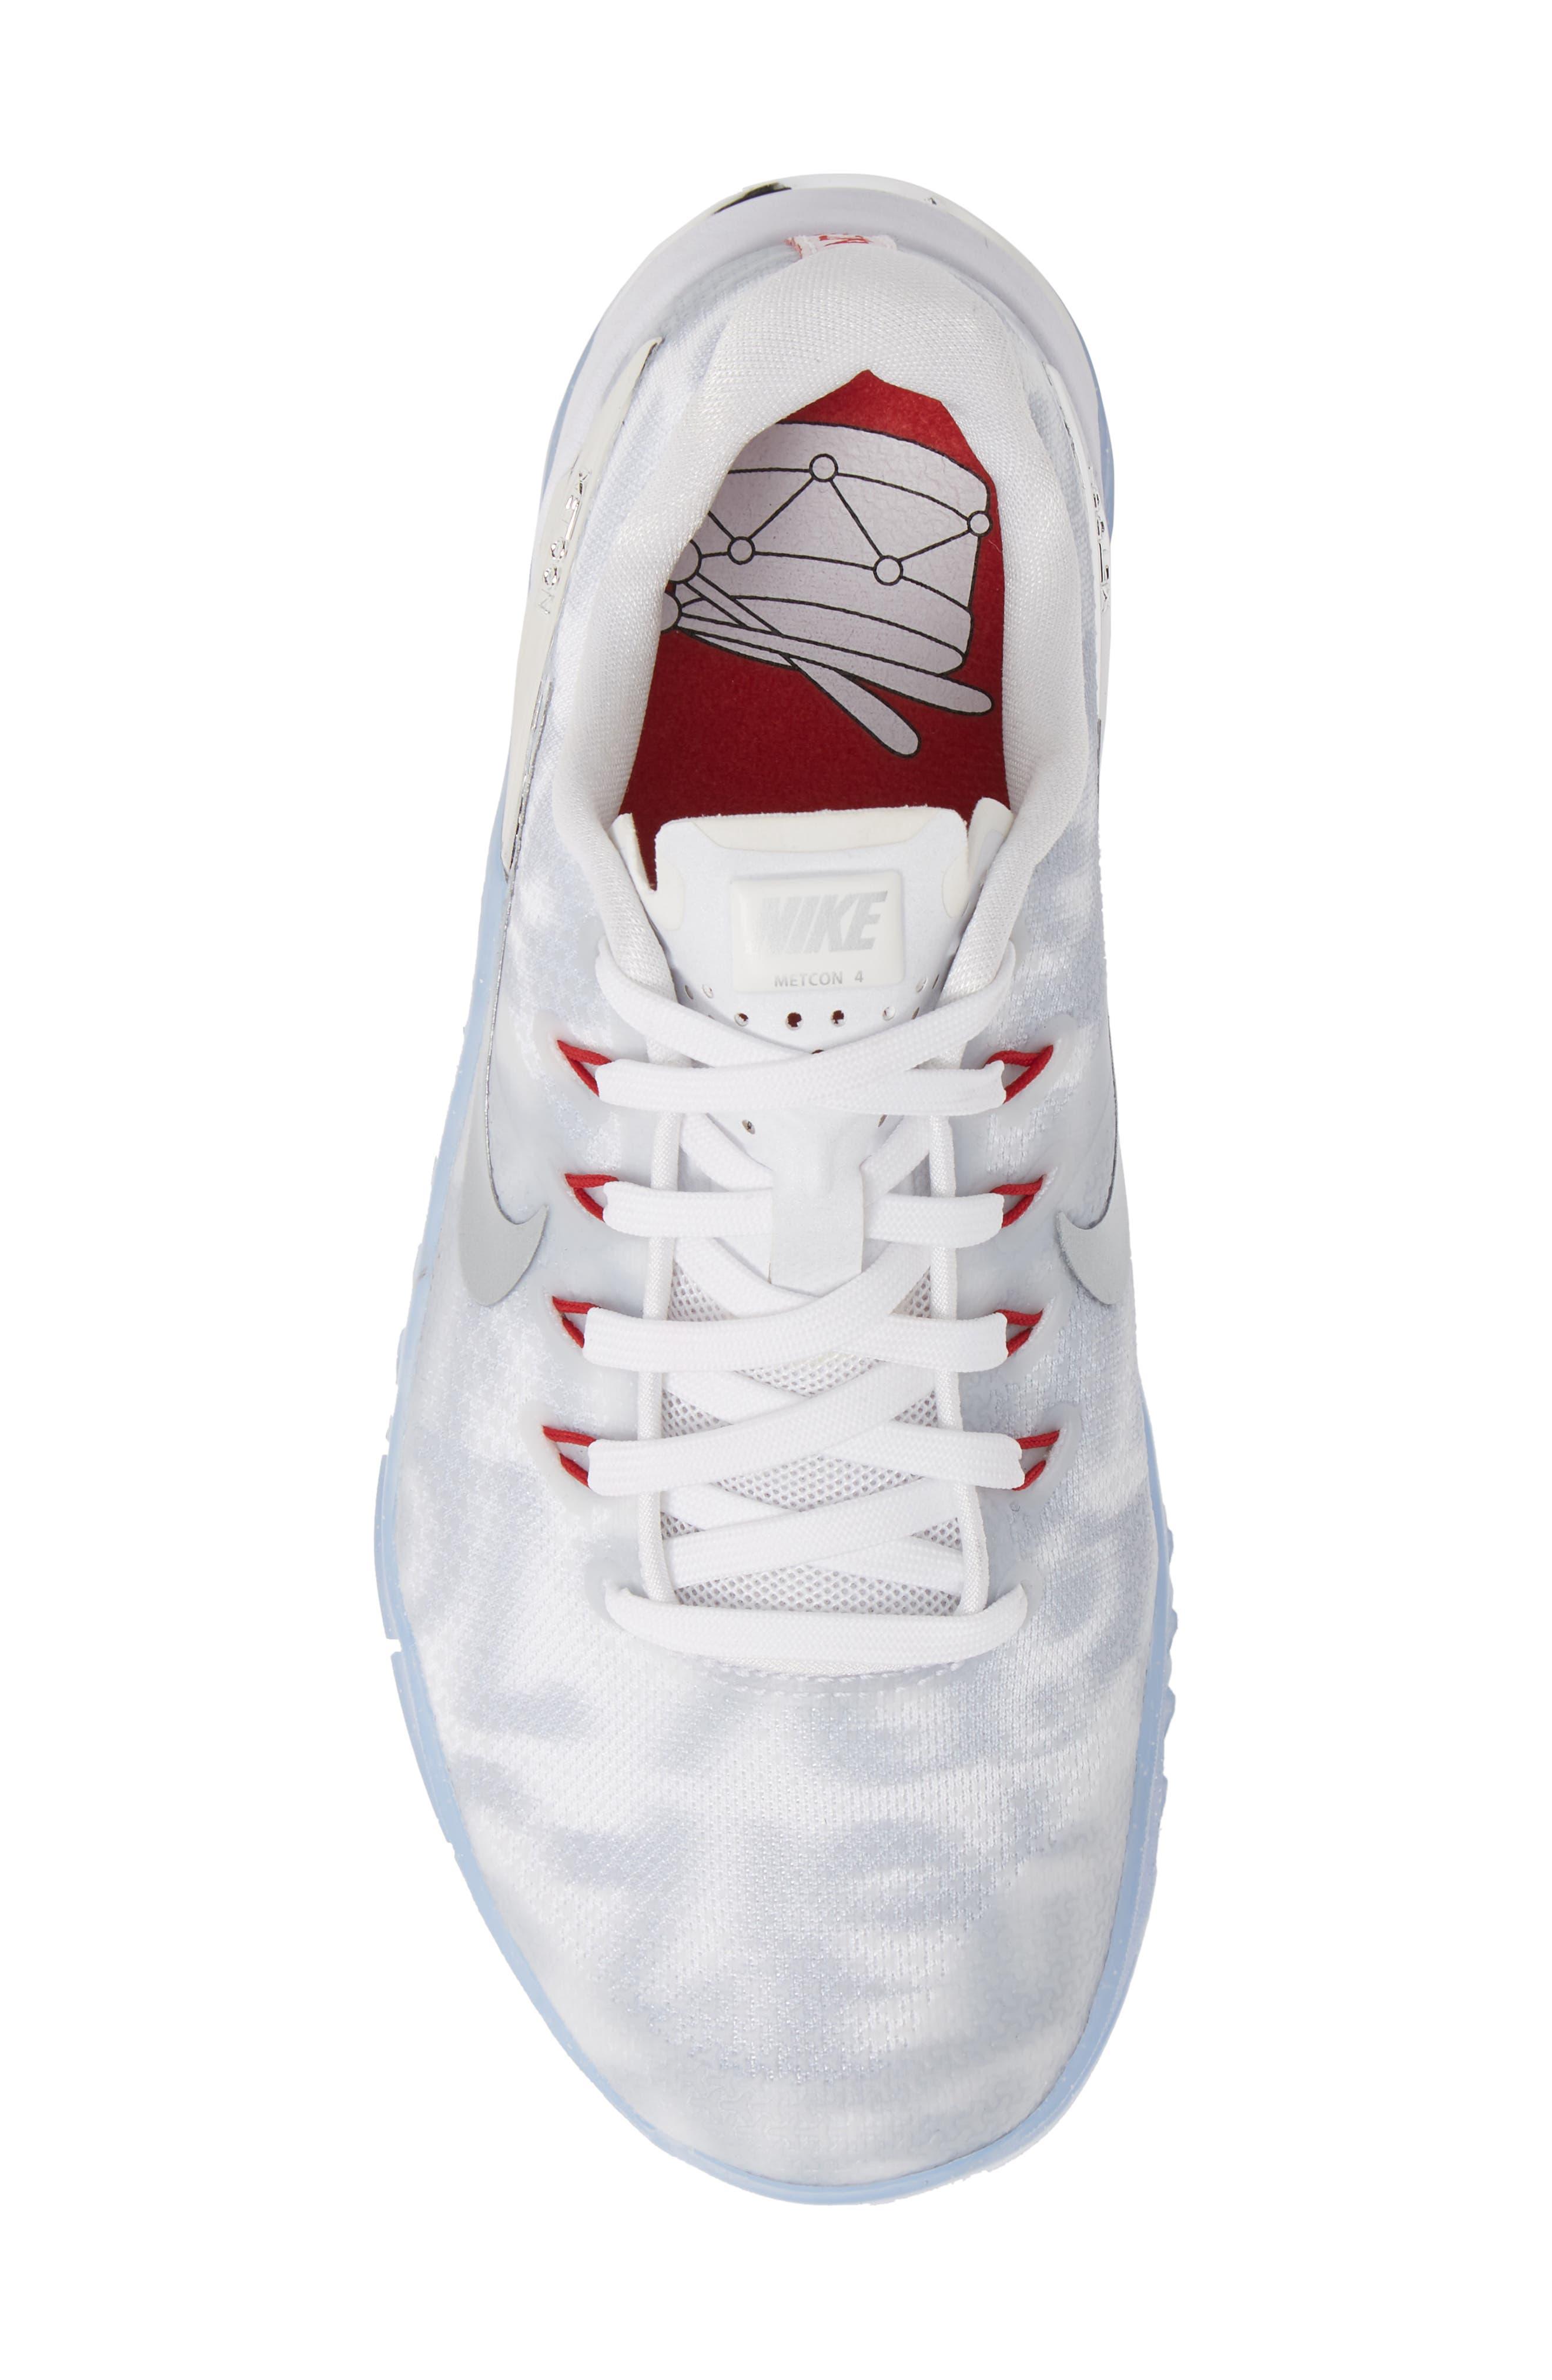 Metcon 4 Training Shoe,                             Alternate thumbnail 5, color,                             WHITE METALLIC SILVER/ GYM RED